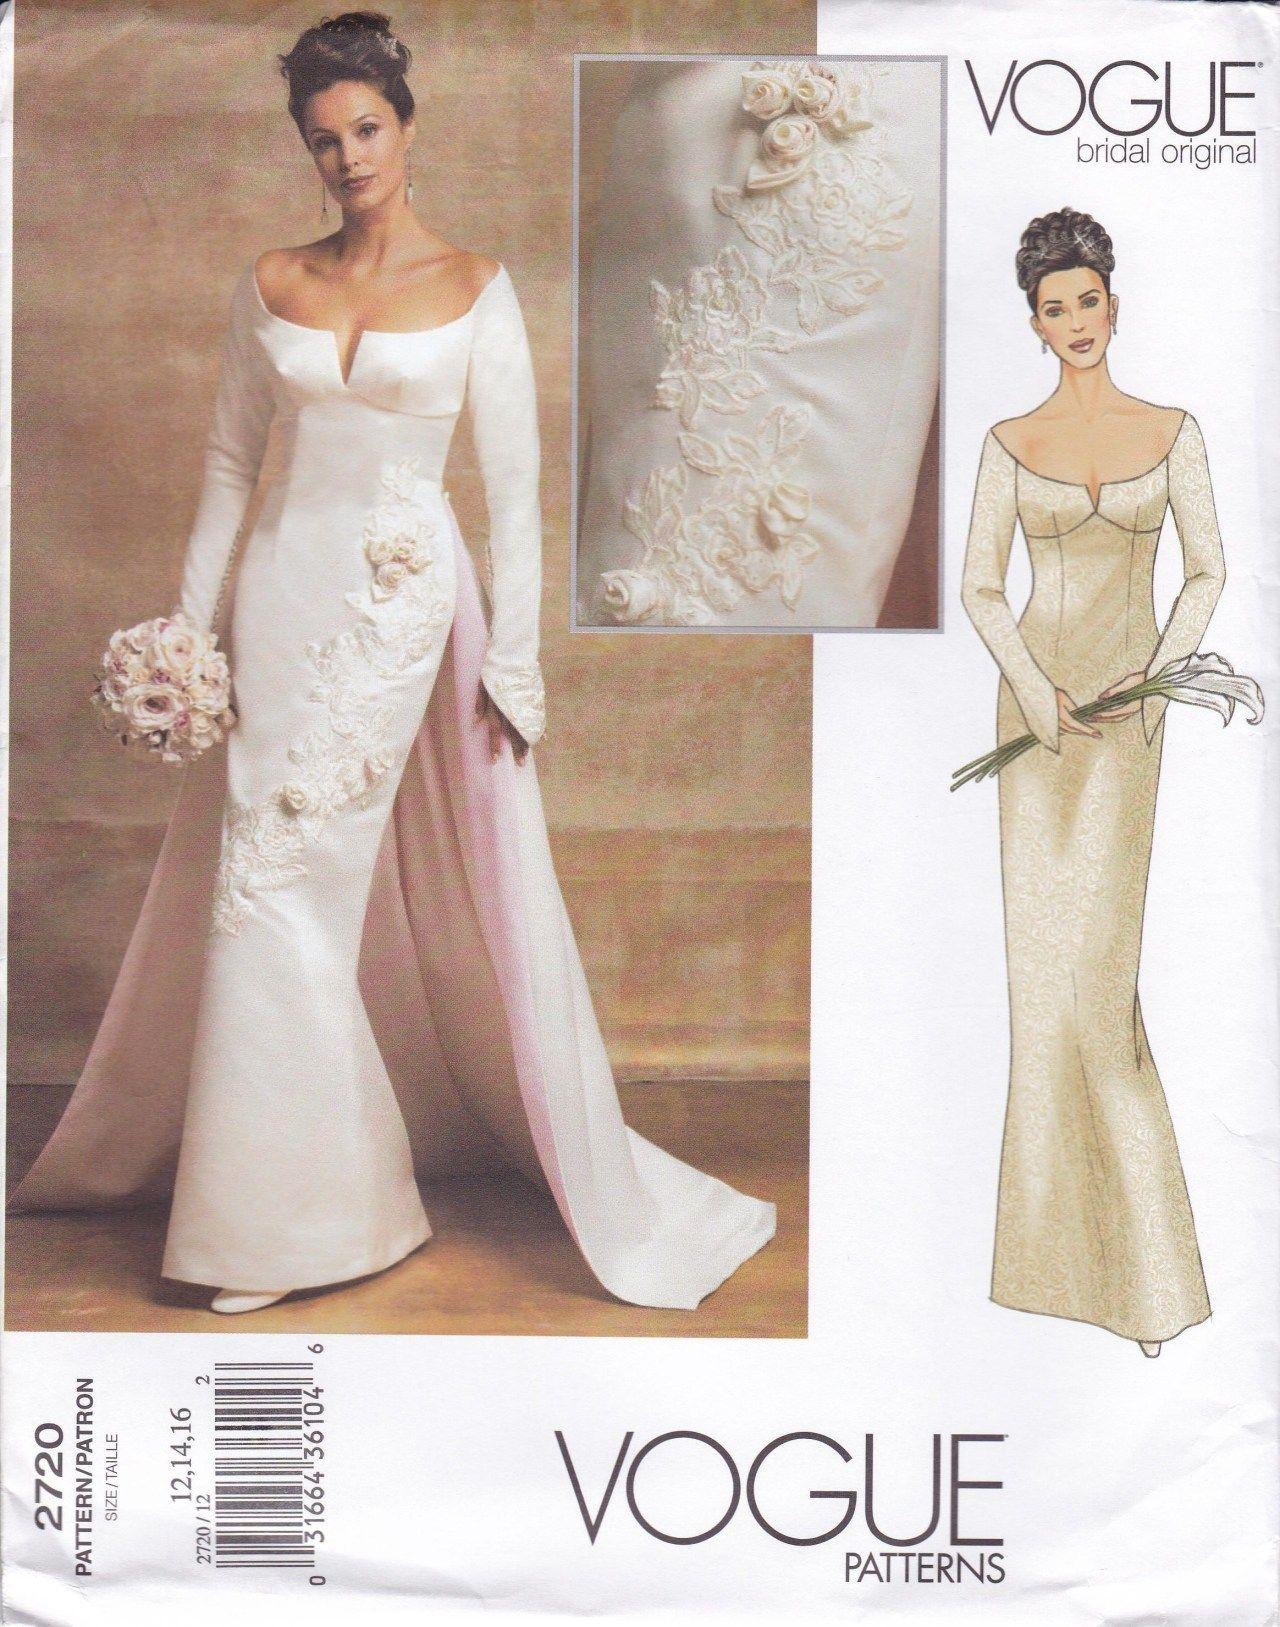 Wedding Dress Patterns To Sew Wedding Gown Sewing Patterns Luxury Free Us Ship Vogue 2720 Bridal Figswoodfiredbistro Com Wedding Dress Sewing Patterns Sewing Wedding Dress Gown Sewing Pattern